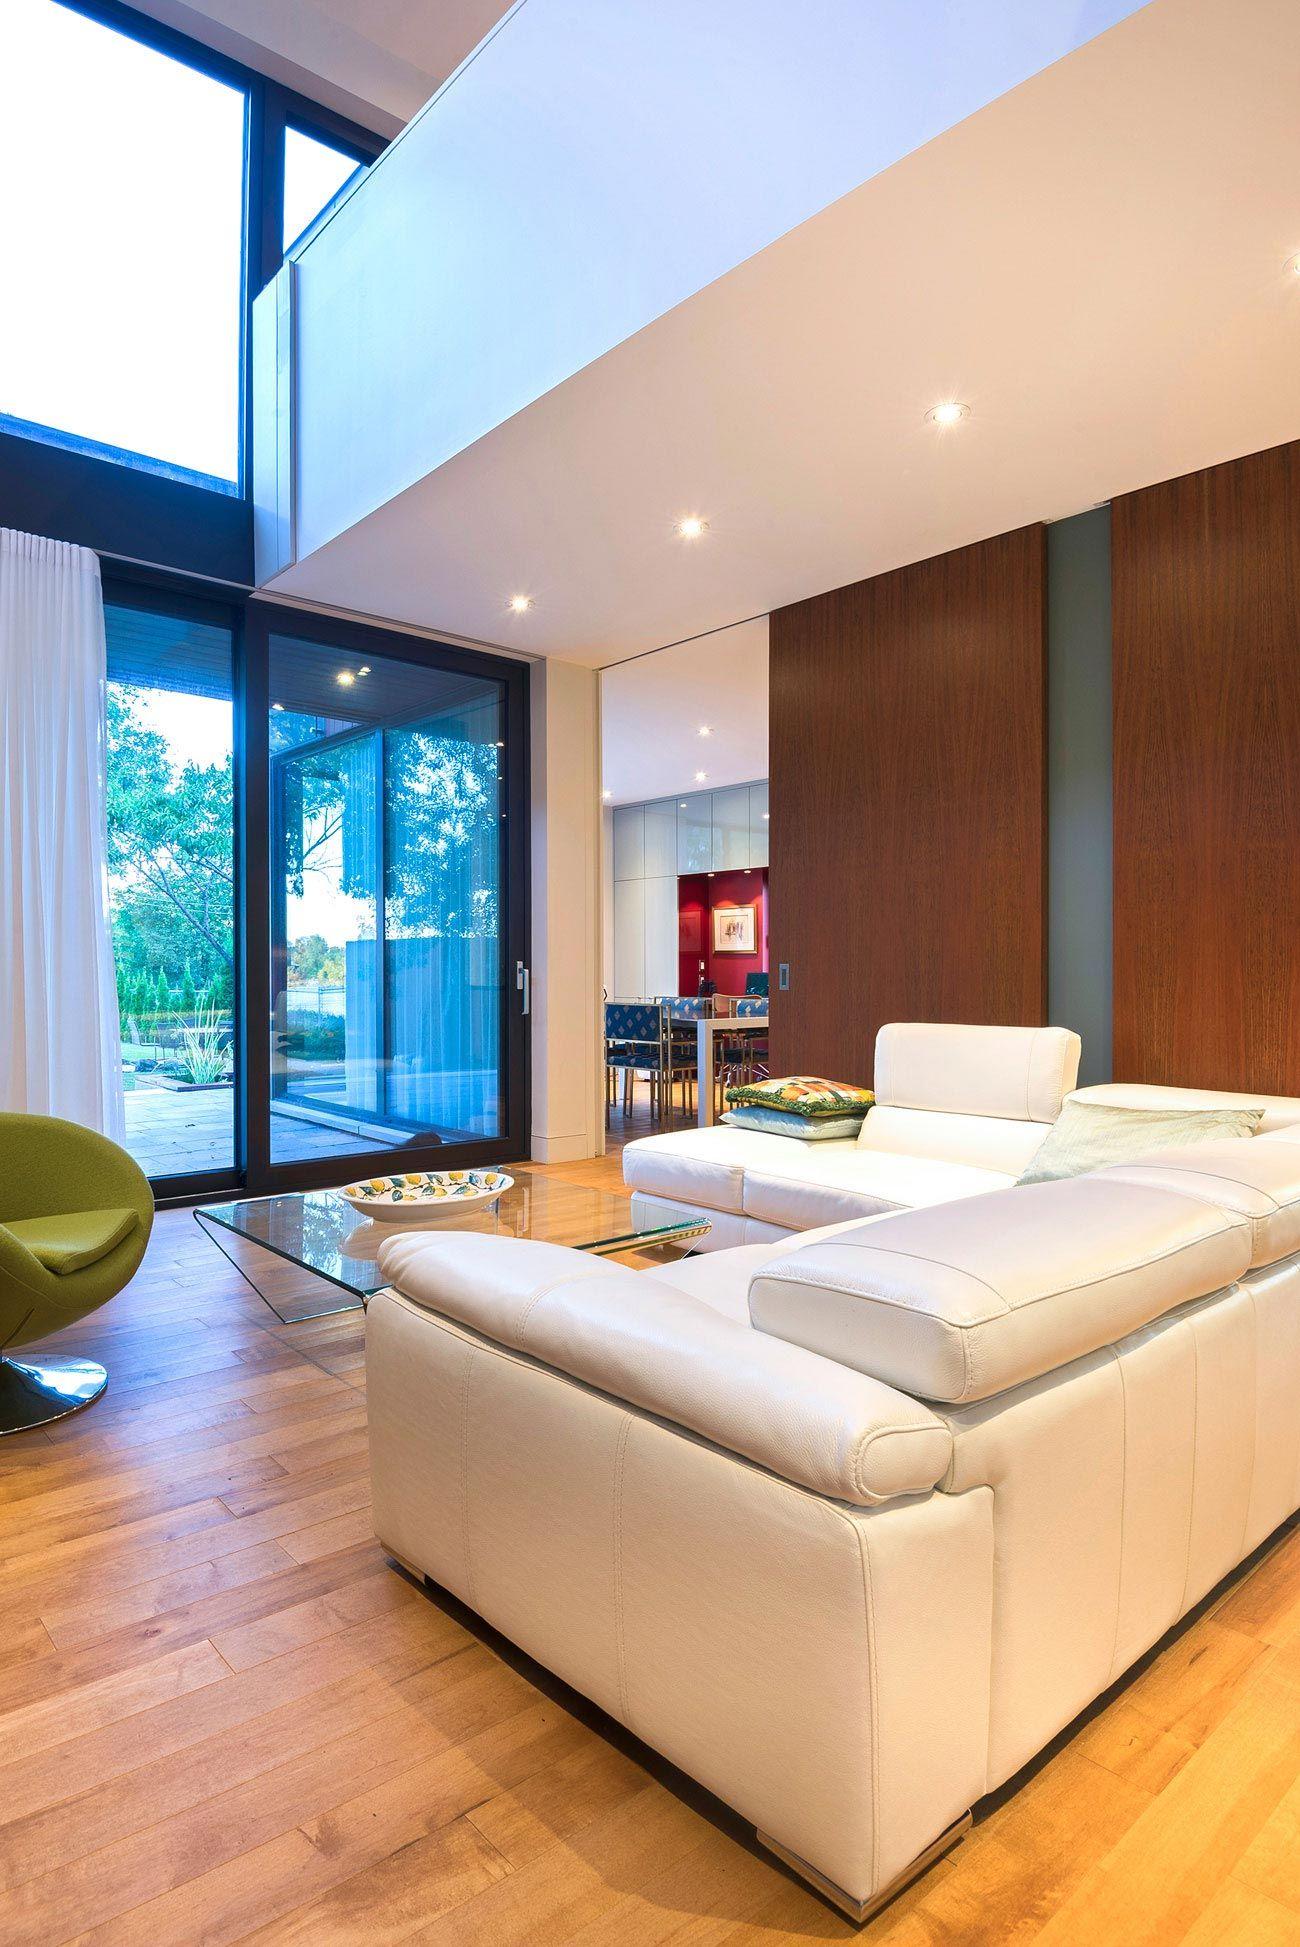 Ch Teaubriand House By Anik Peloquin Architecte